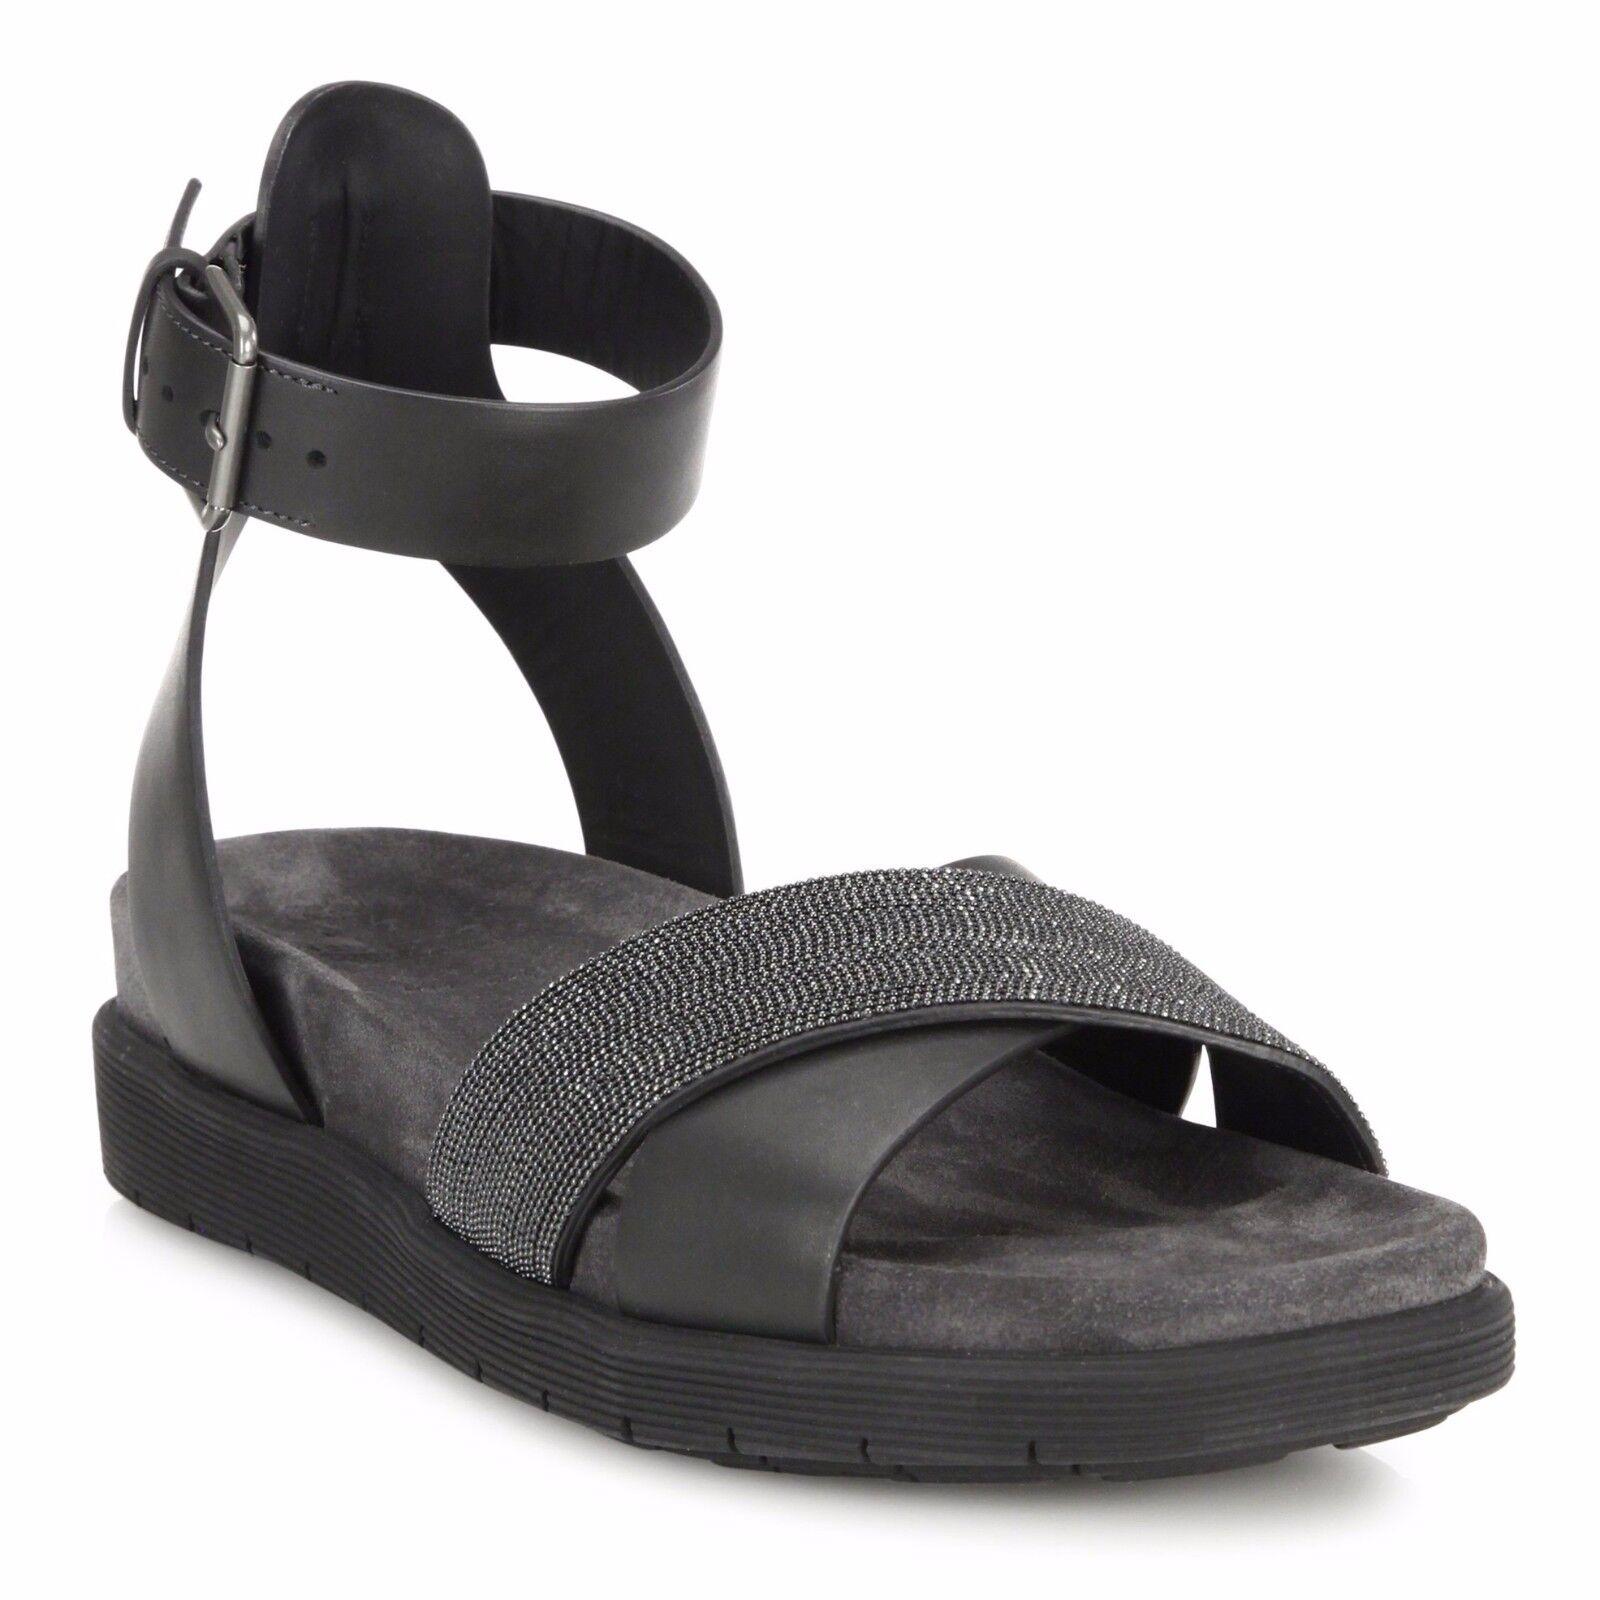 NEW  1395 Brunello Cucinelli Ankle Wrap Monili Crisscross Leather Sandal 37.5